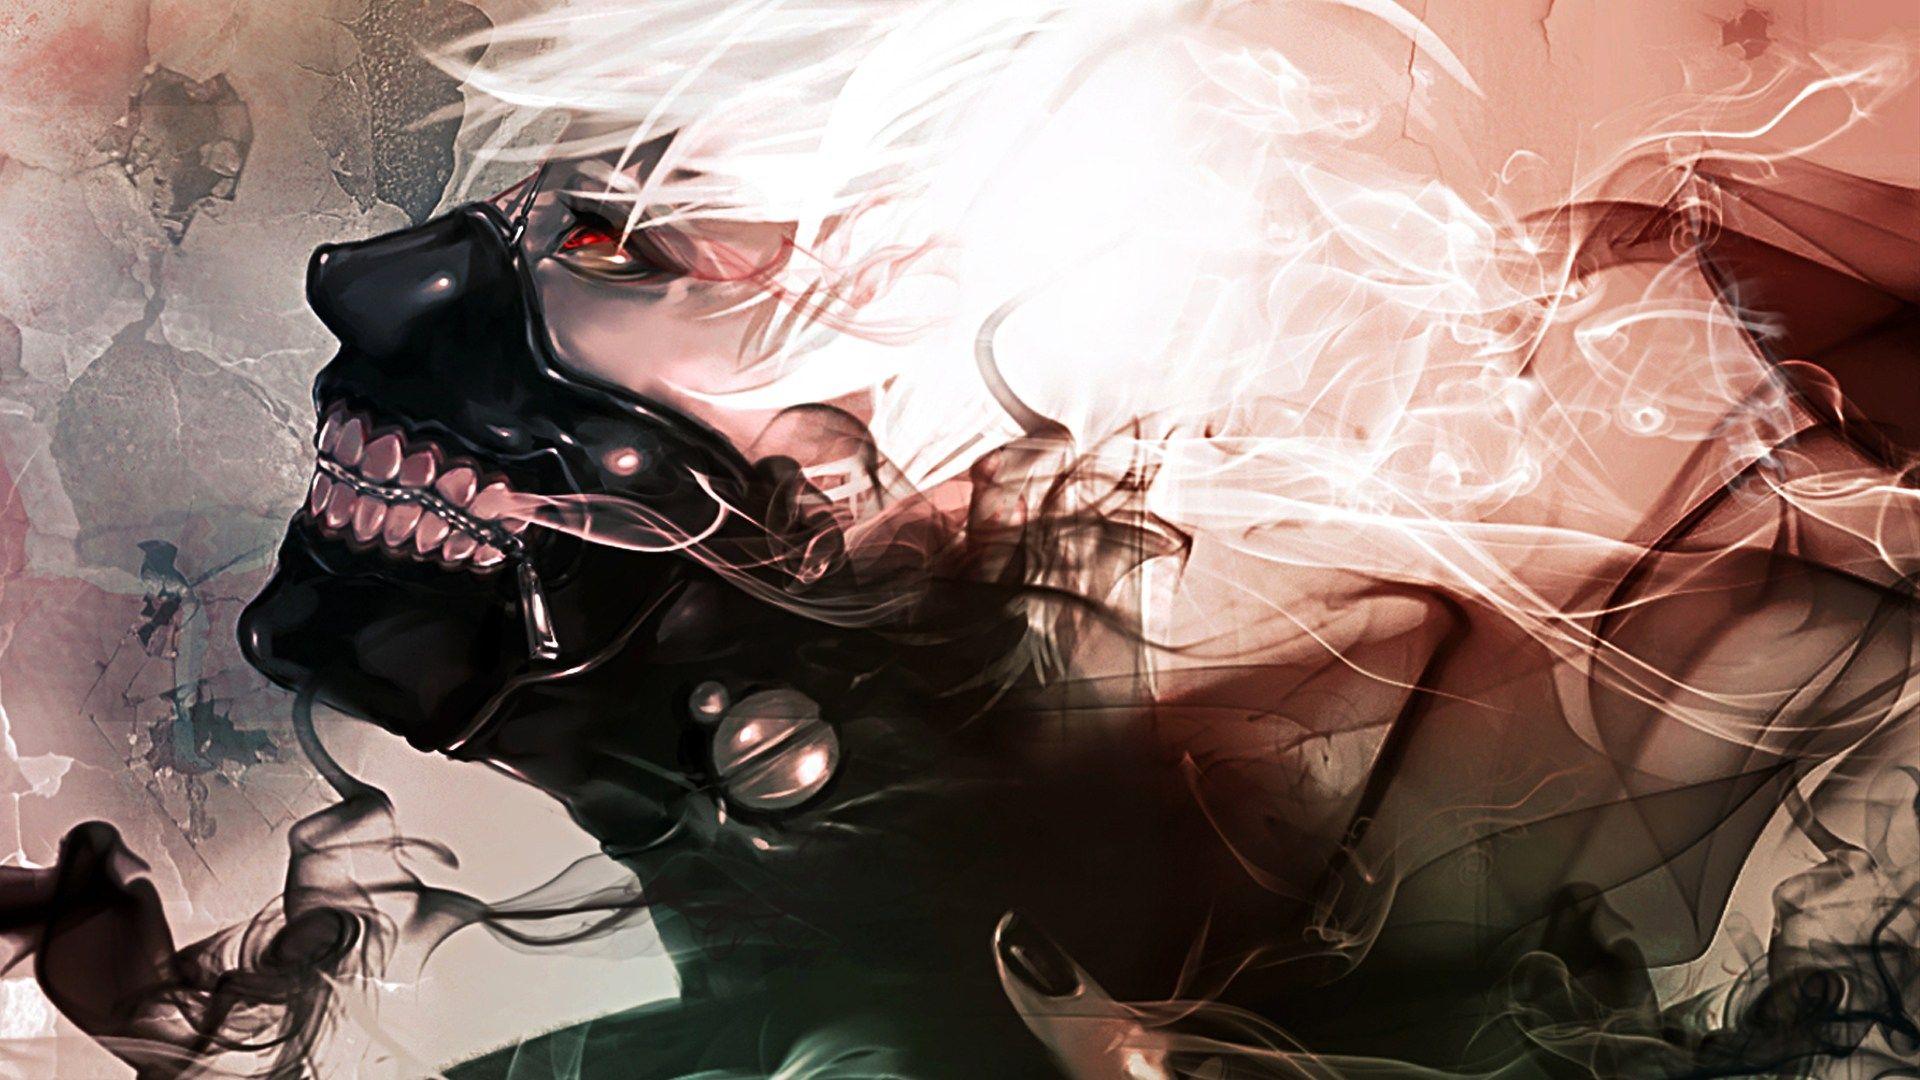 Manga Anime Wallpaper 1 Hd Art Epic Heroes Video Gallery